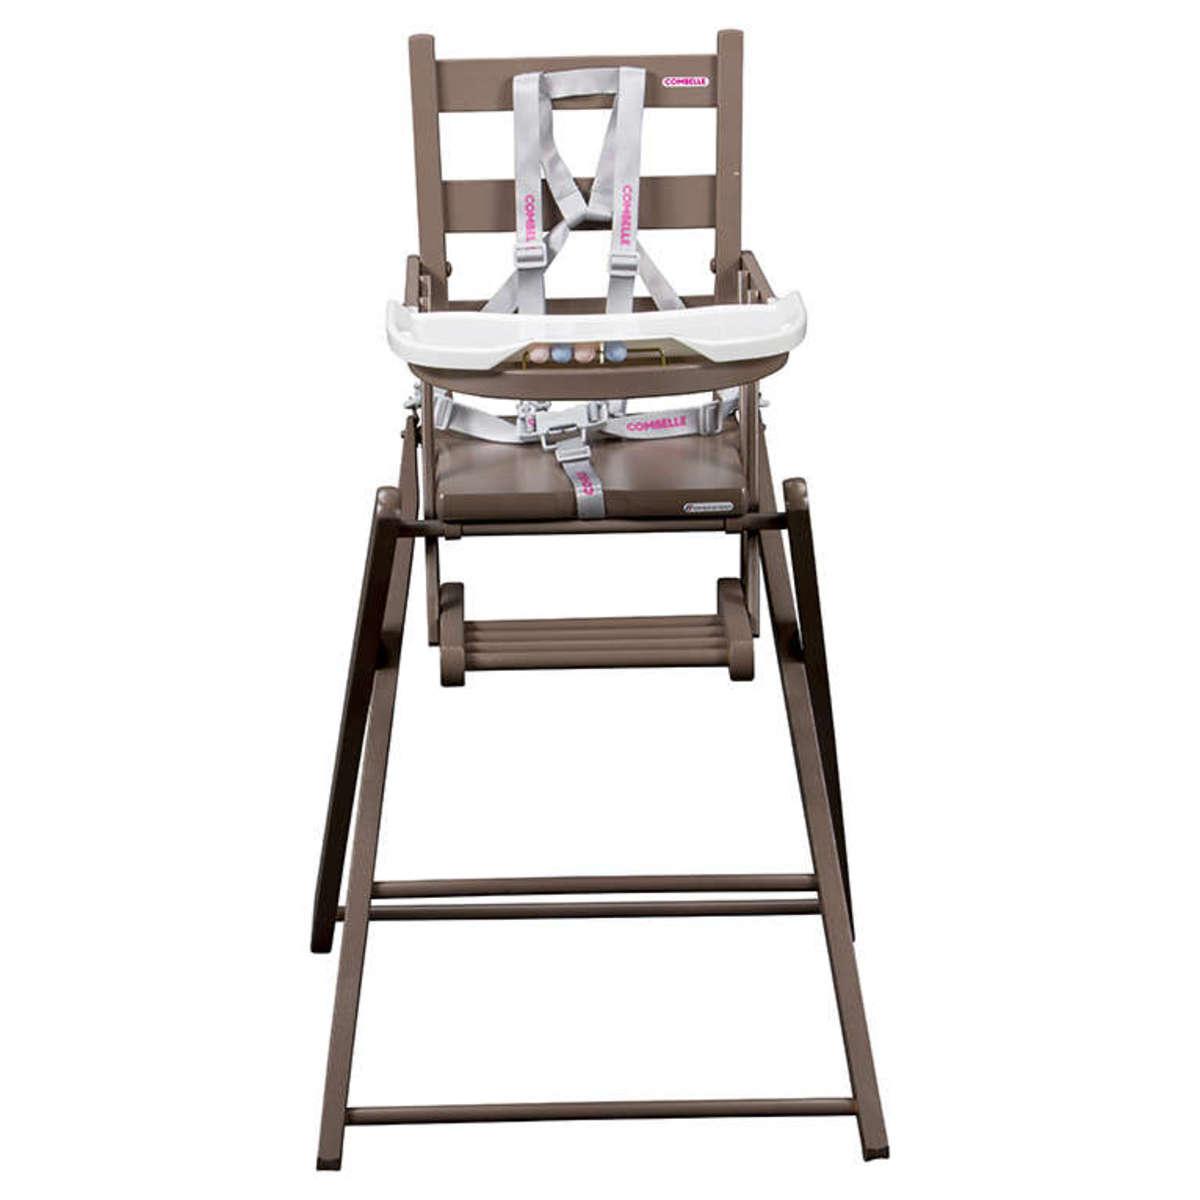 combelle chaise haute extra pliante sarah laqu taupe chaise haute combelle sur l 39 armoire de. Black Bedroom Furniture Sets. Home Design Ideas